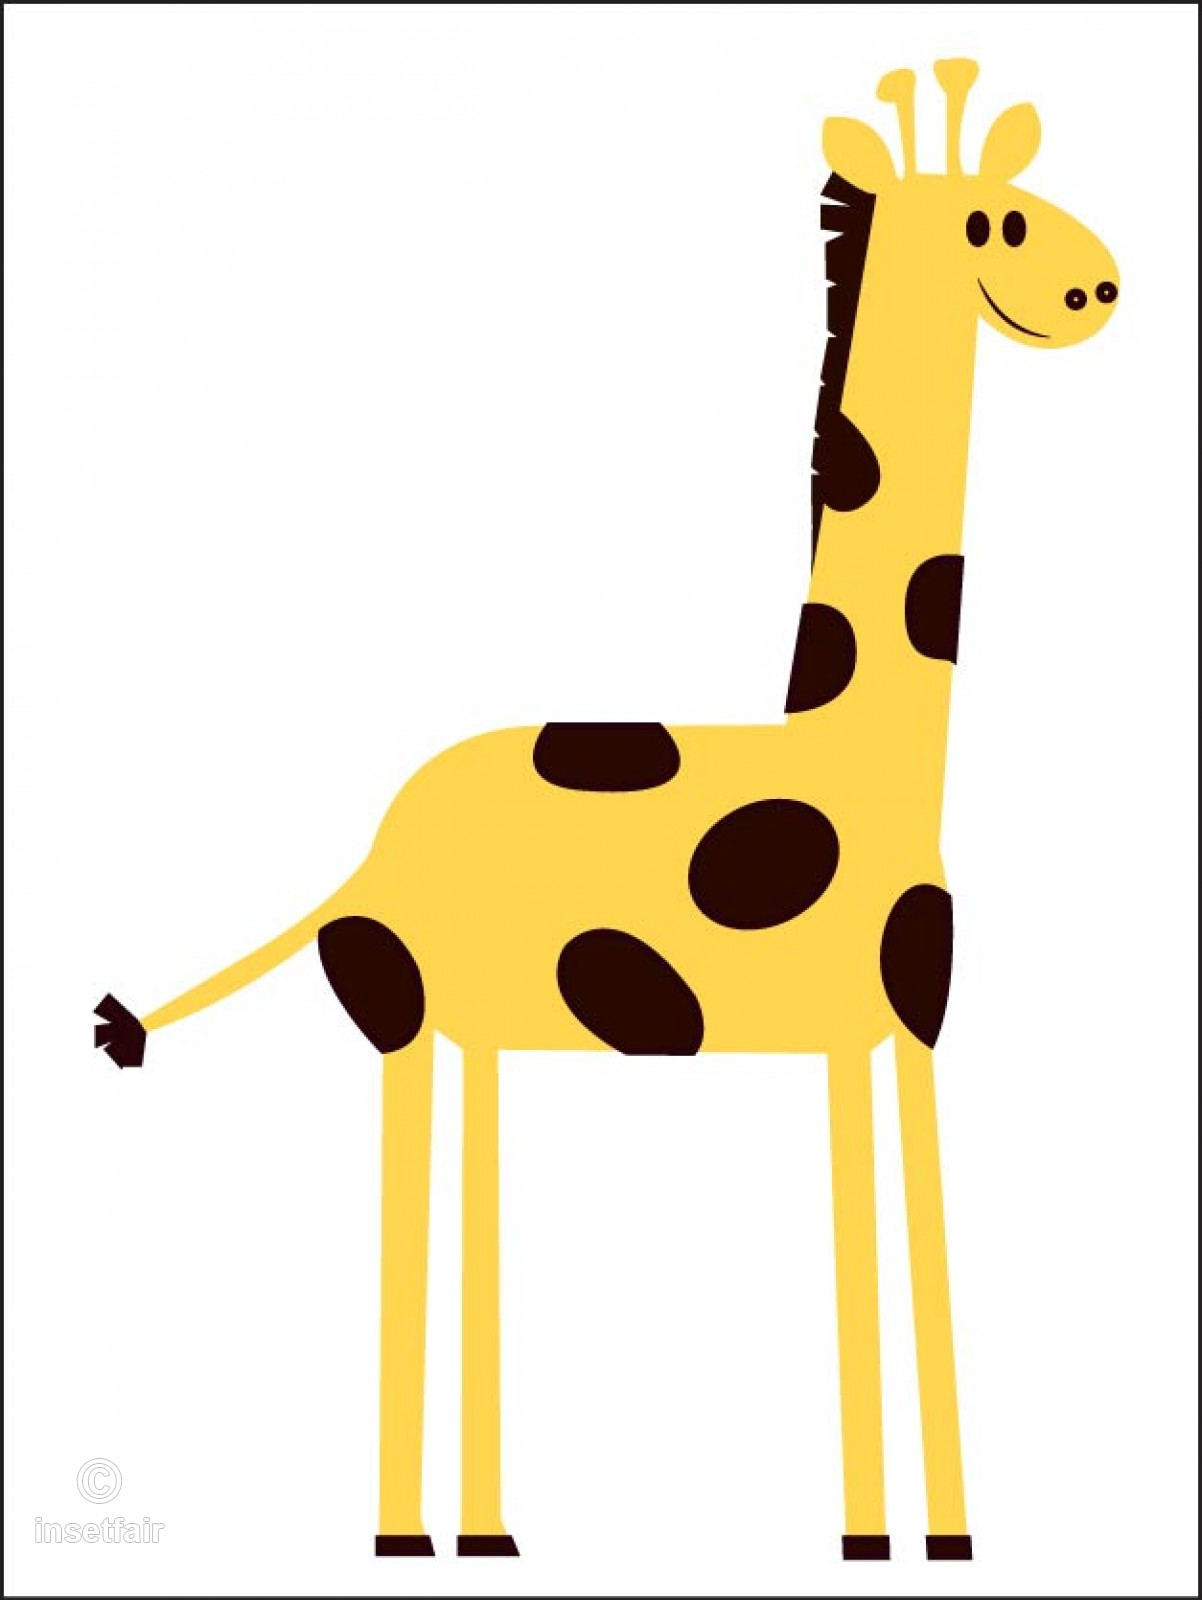 Free giraffe cartoon clipart picture stock Giraffe cartoon clipart free downlaod picture stock